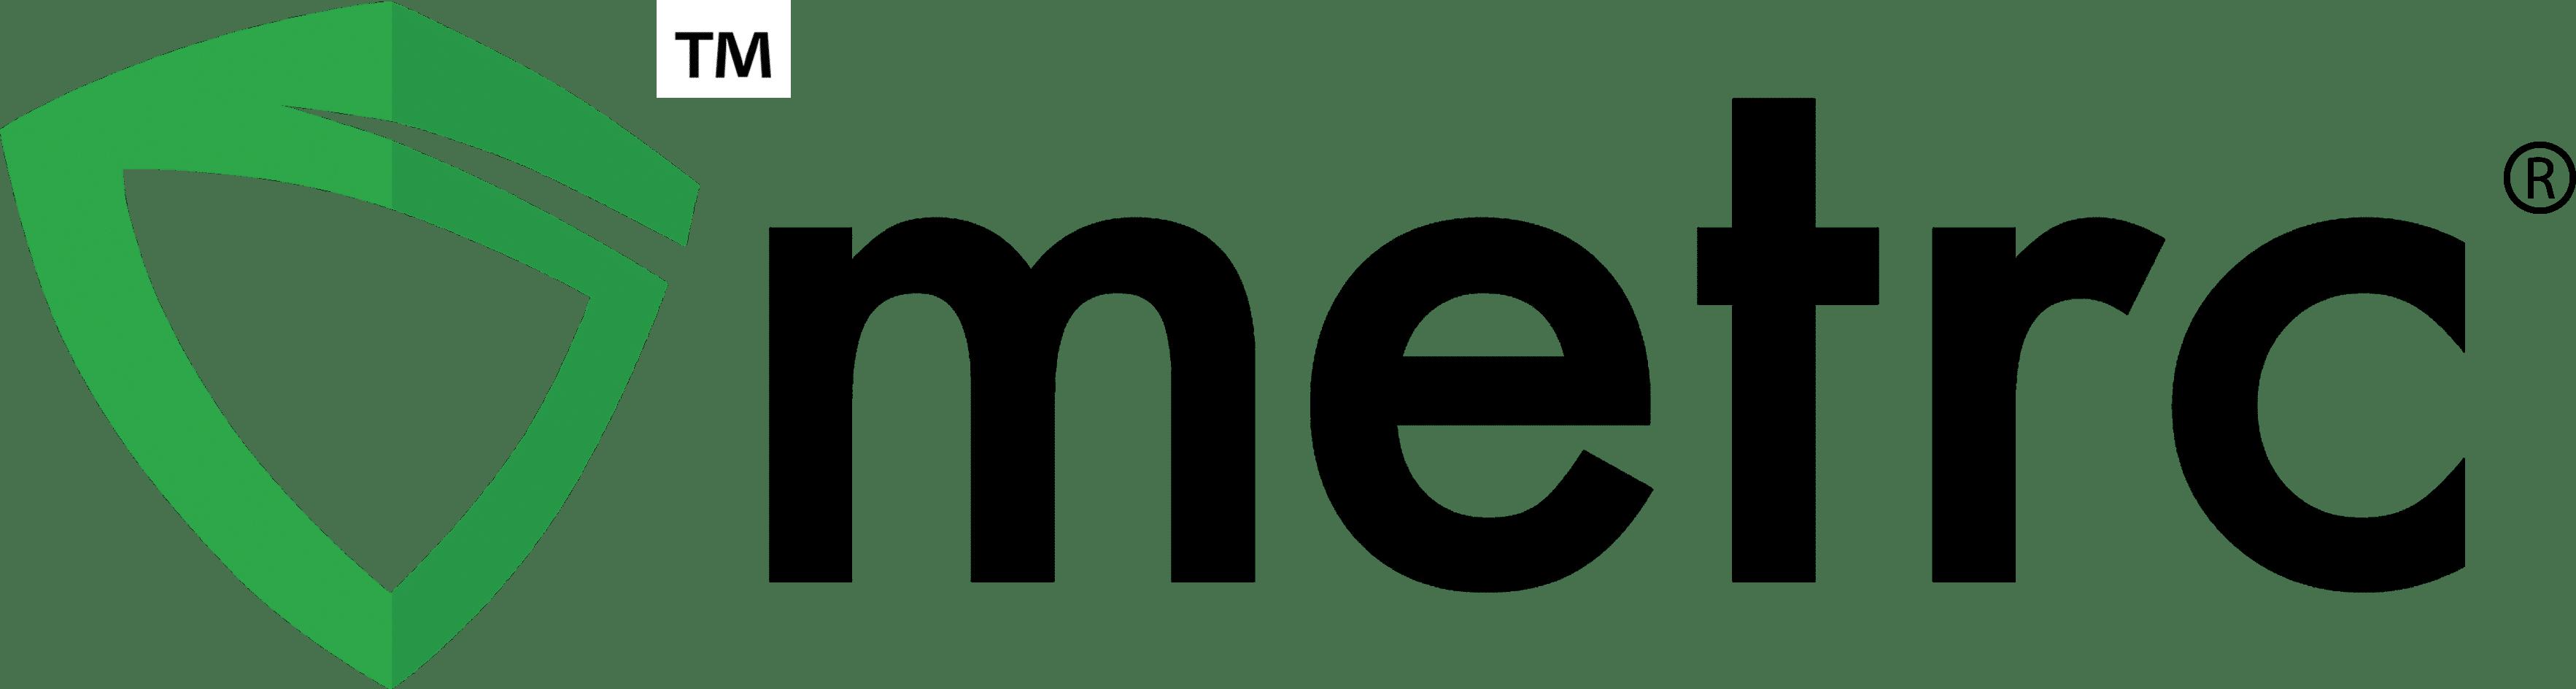 Metrc Classes